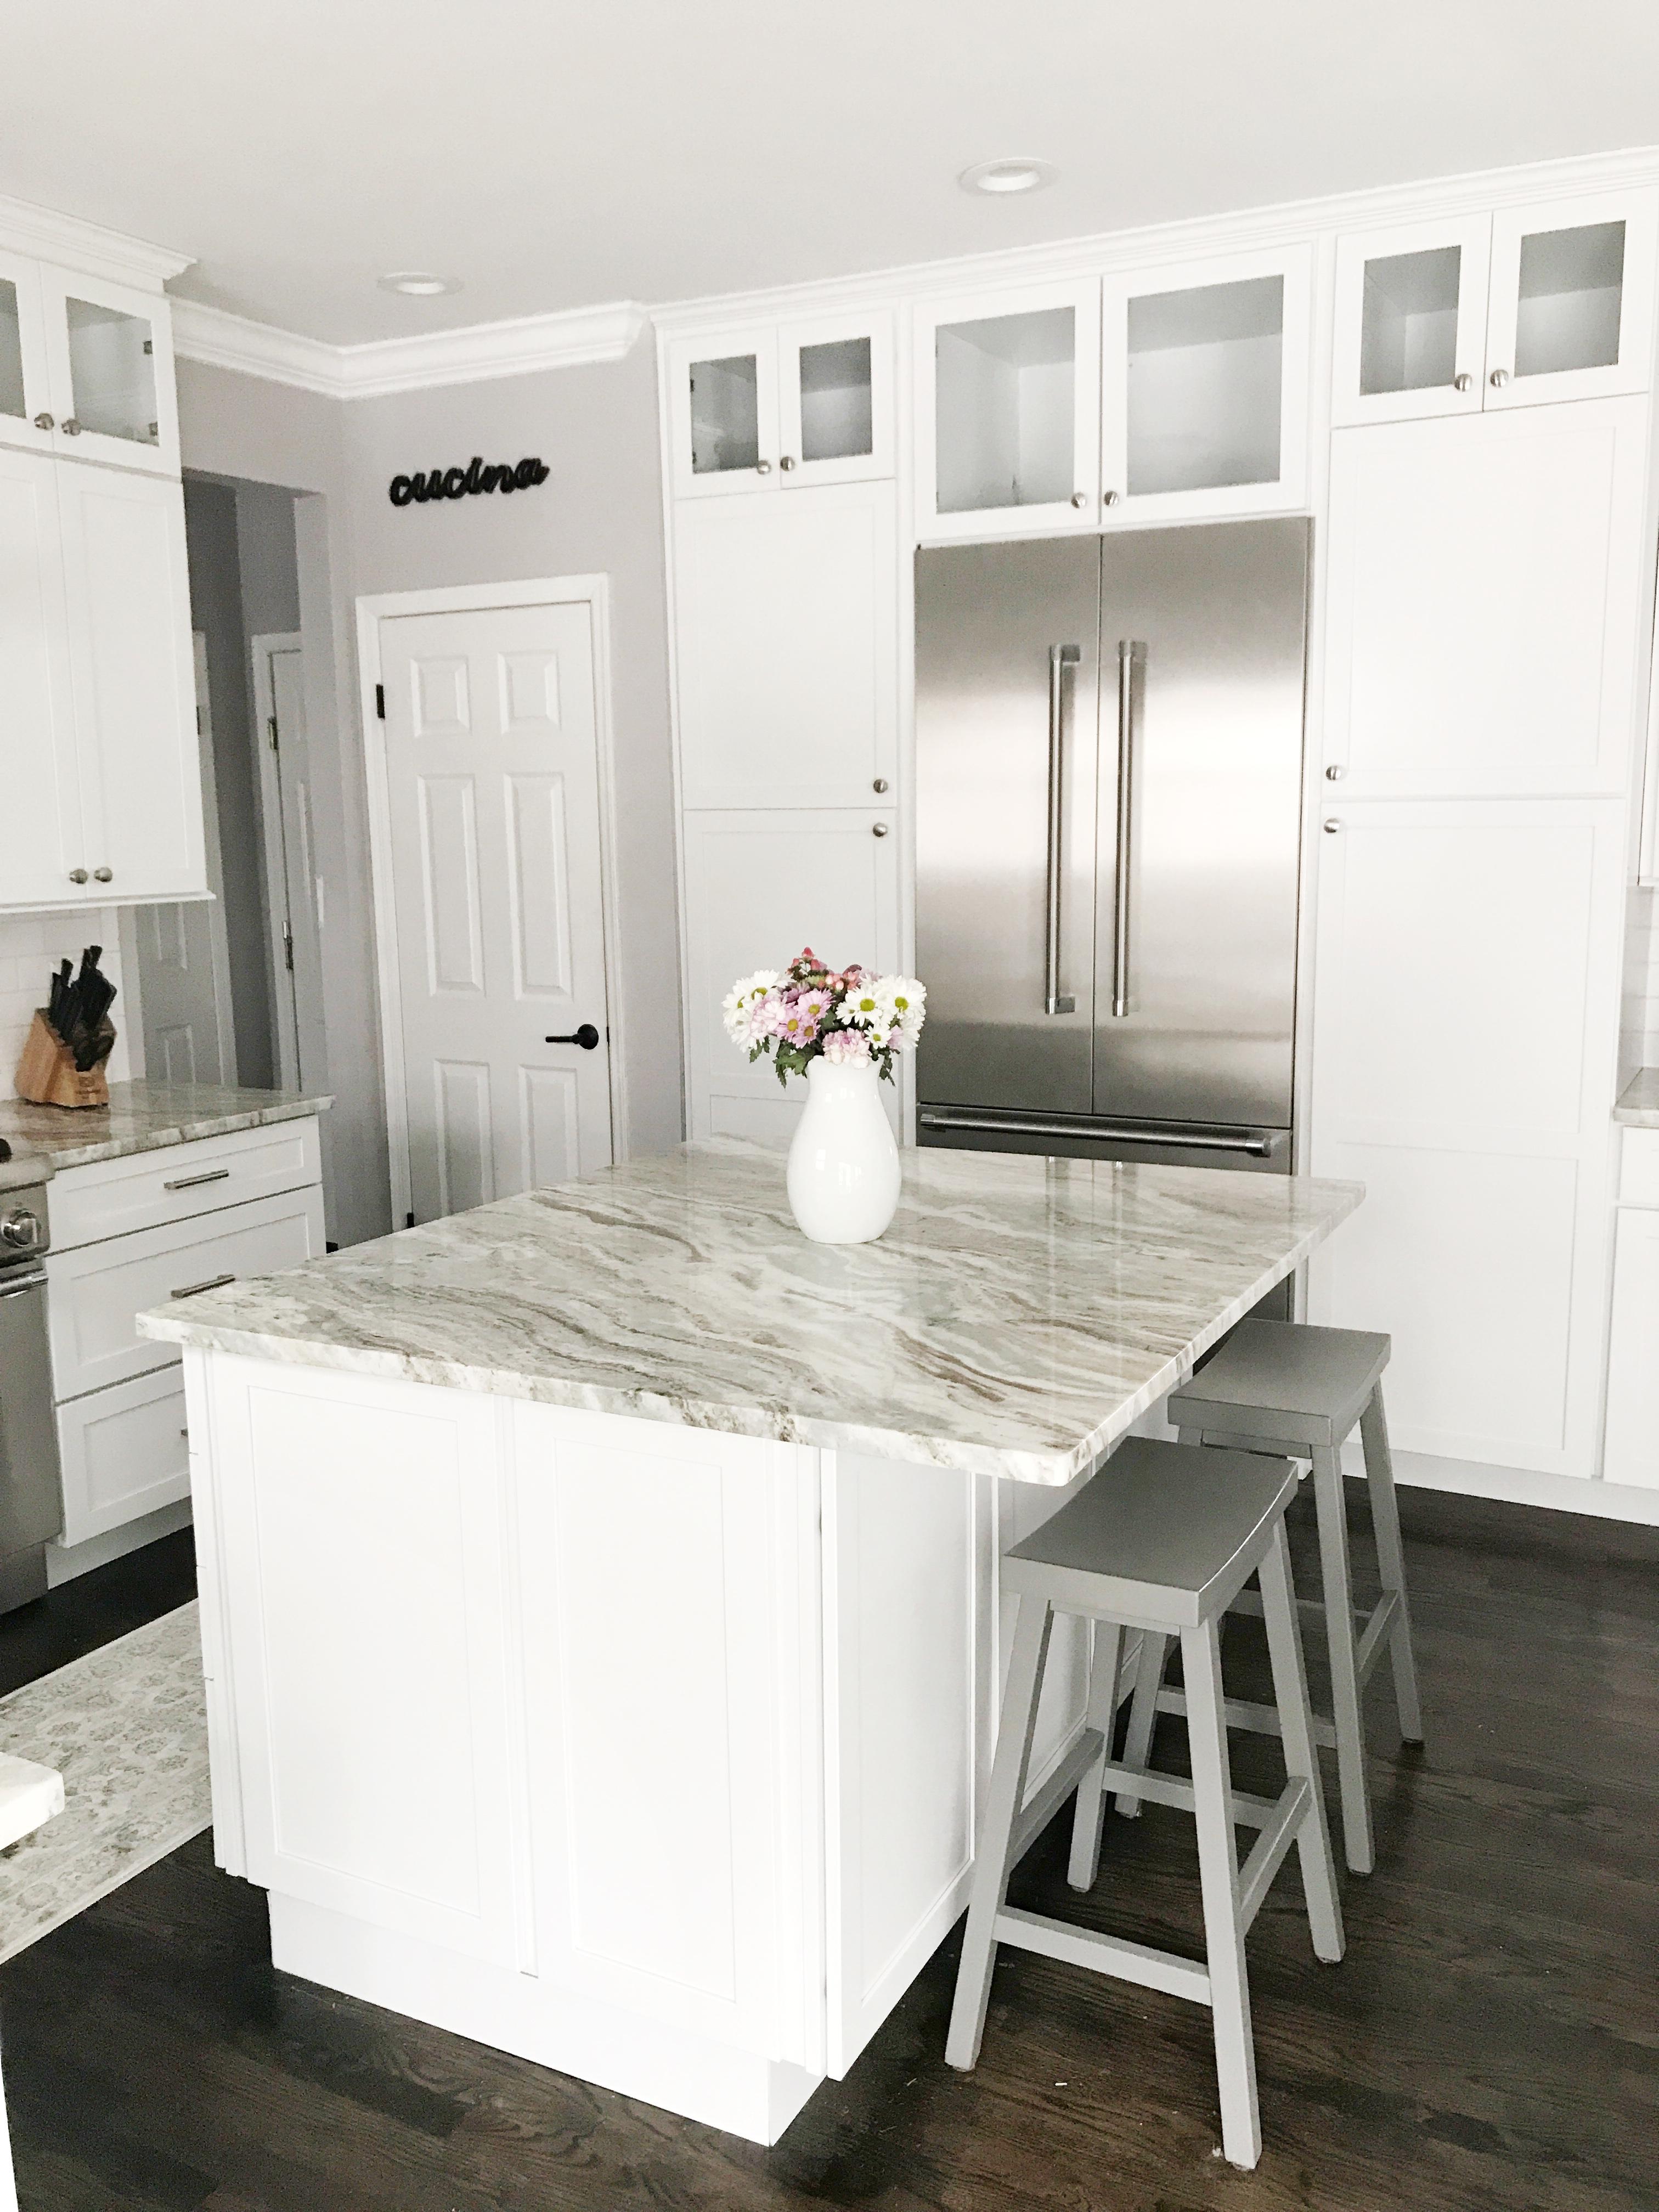 My Kitchen | MrsCasual